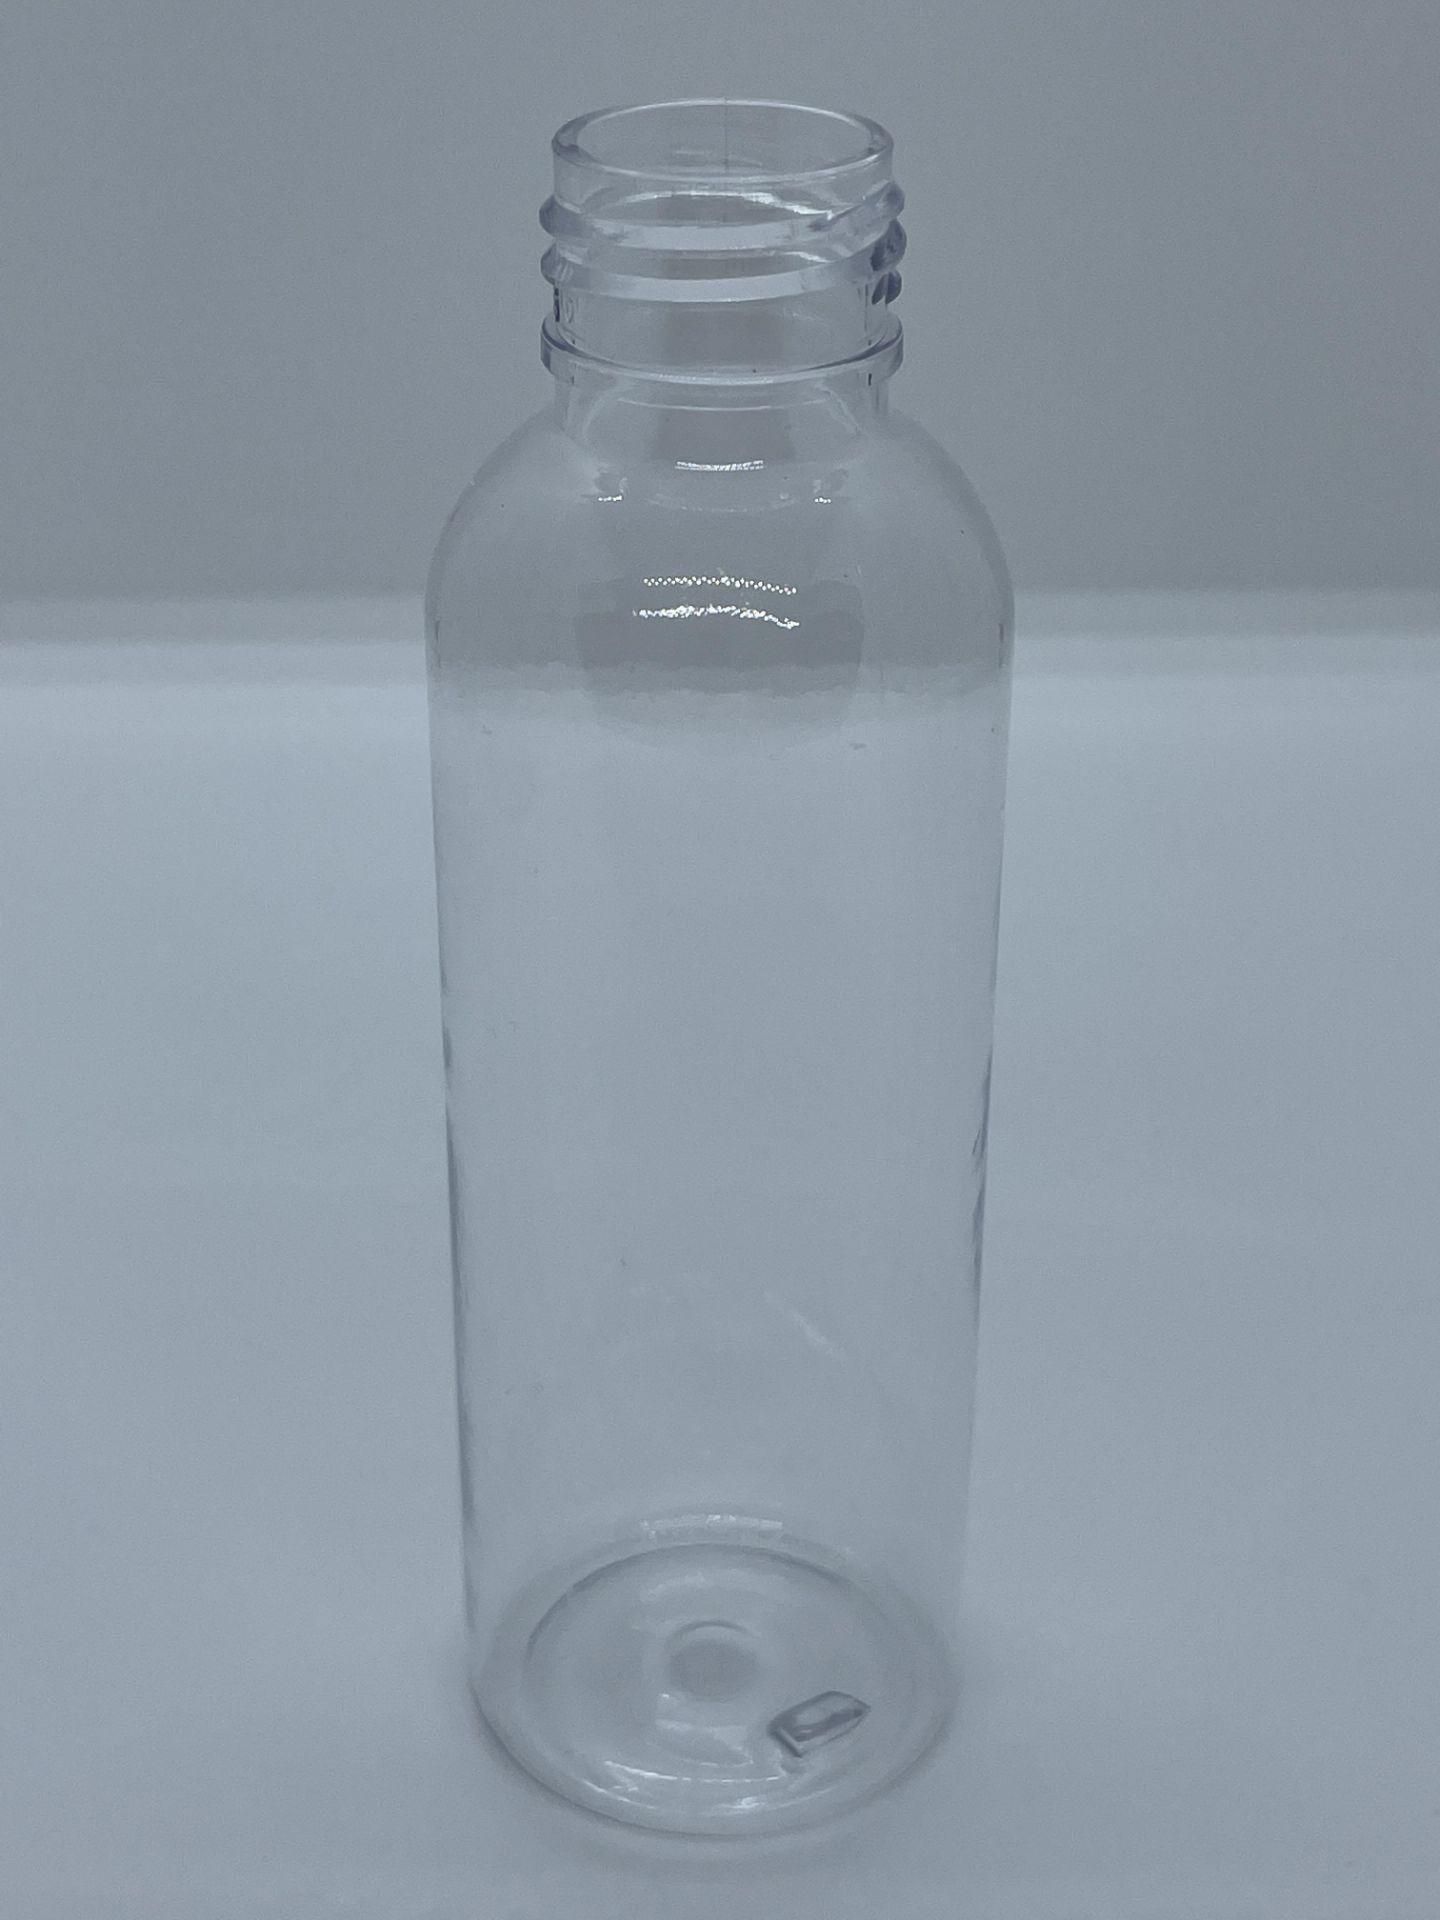 "96,000 - Clear Plastic Bullet 4 oz Empty Bottles, 24-410 Threading Neck, 5"" Tall, 1 5/8"" Diameter - Image 2 of 4"